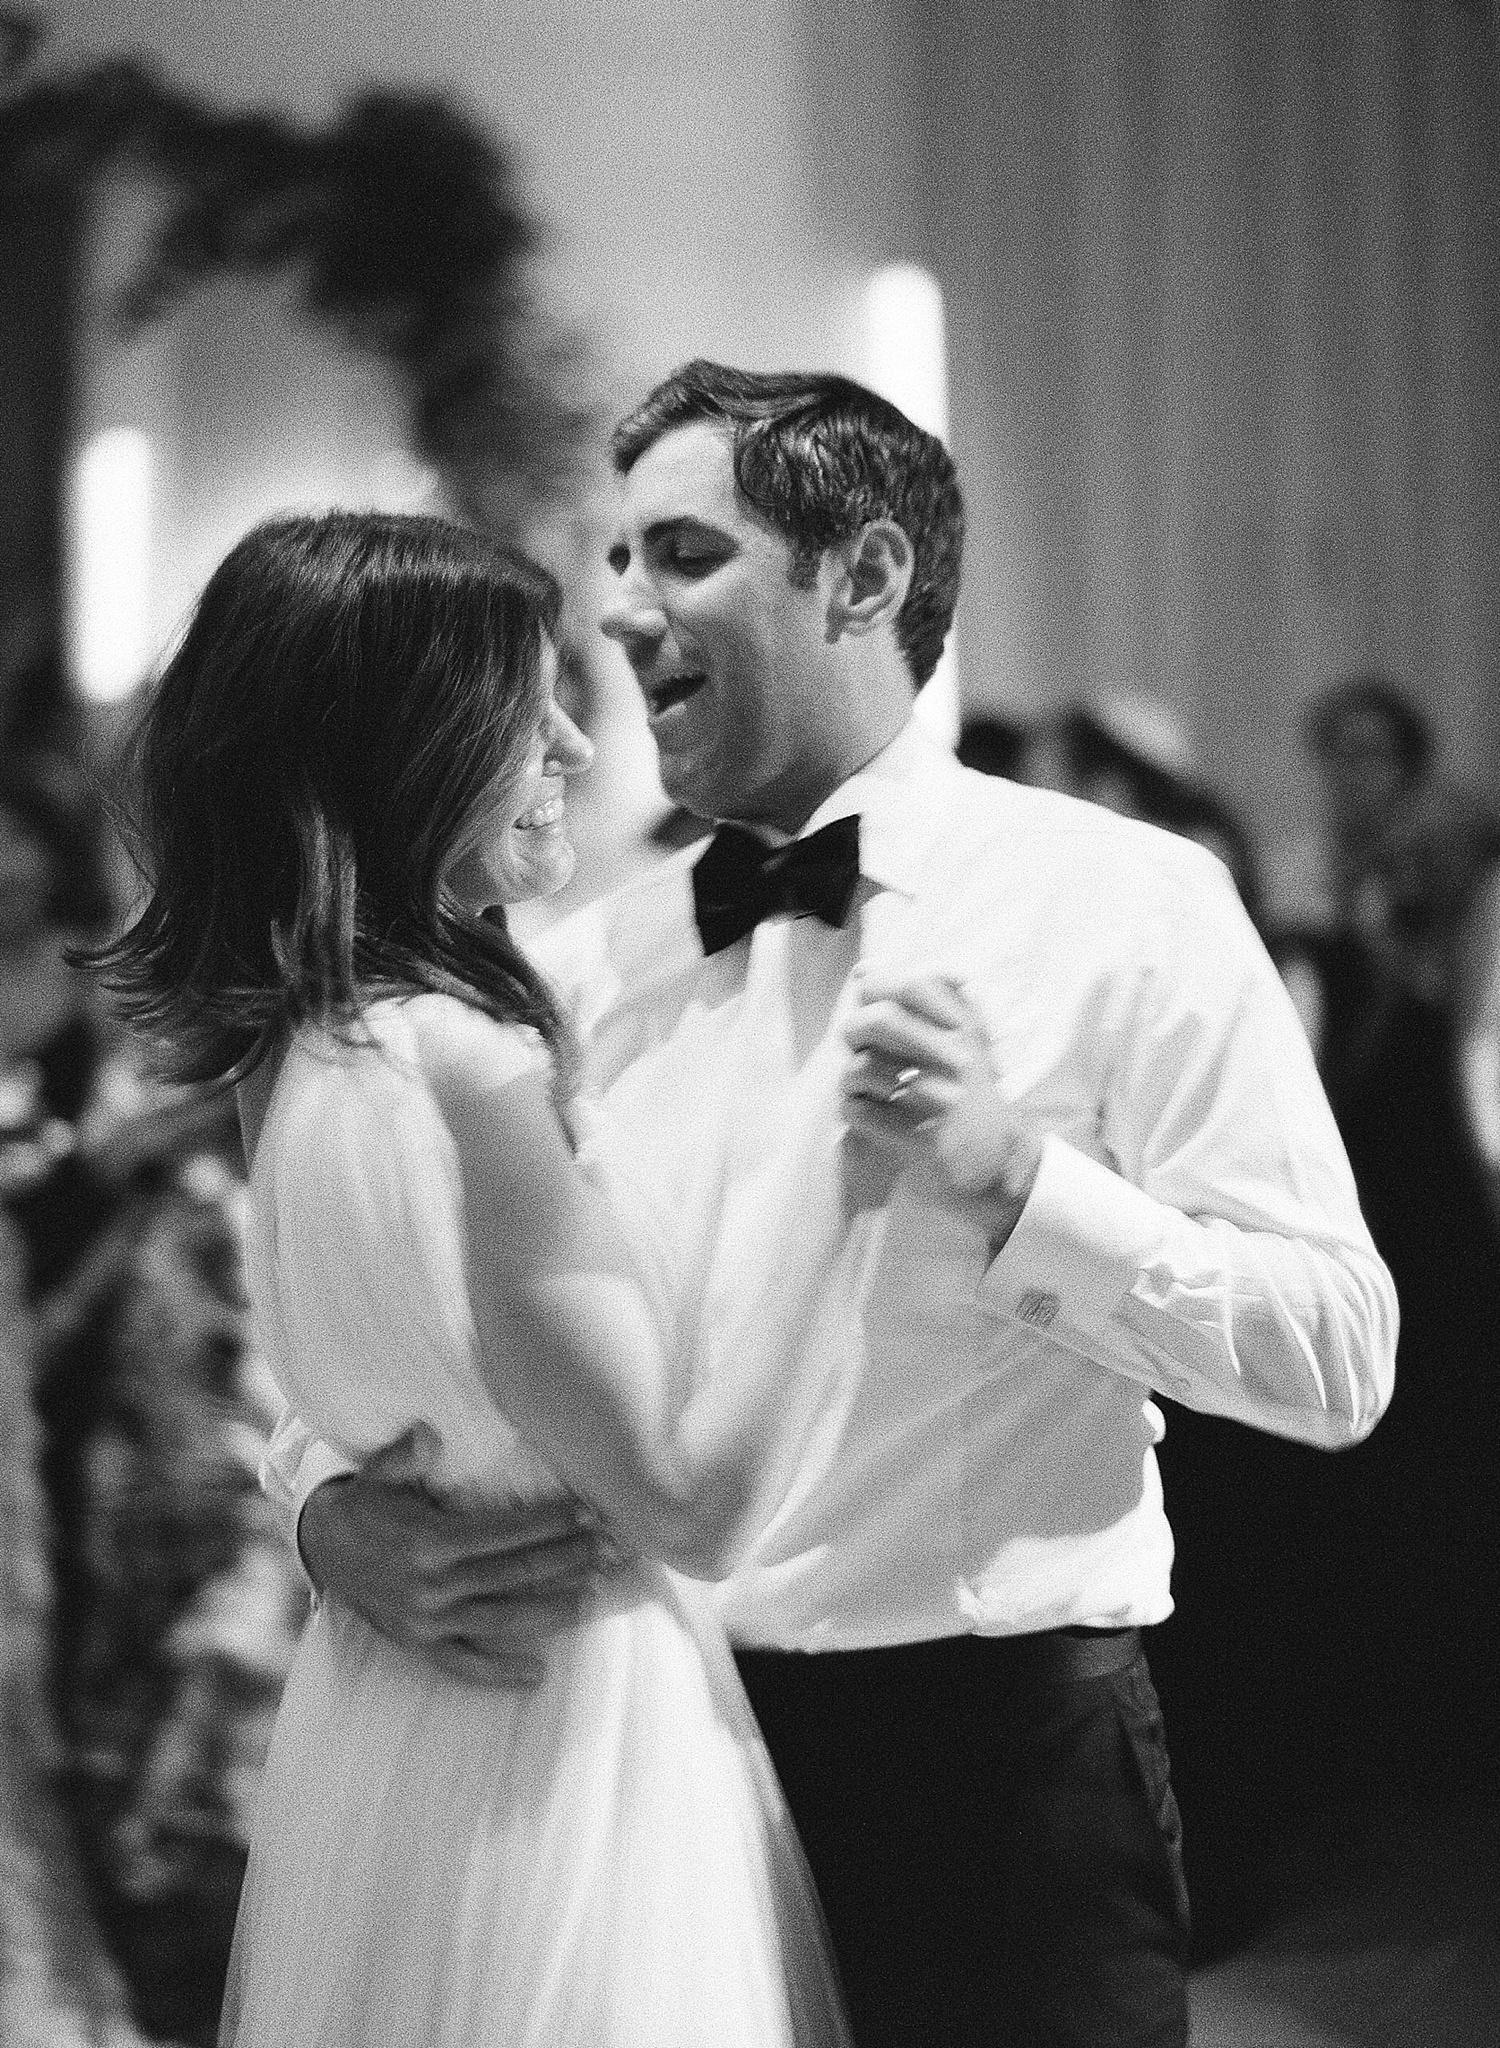 25_dewberry_charleston_wedding.jpg